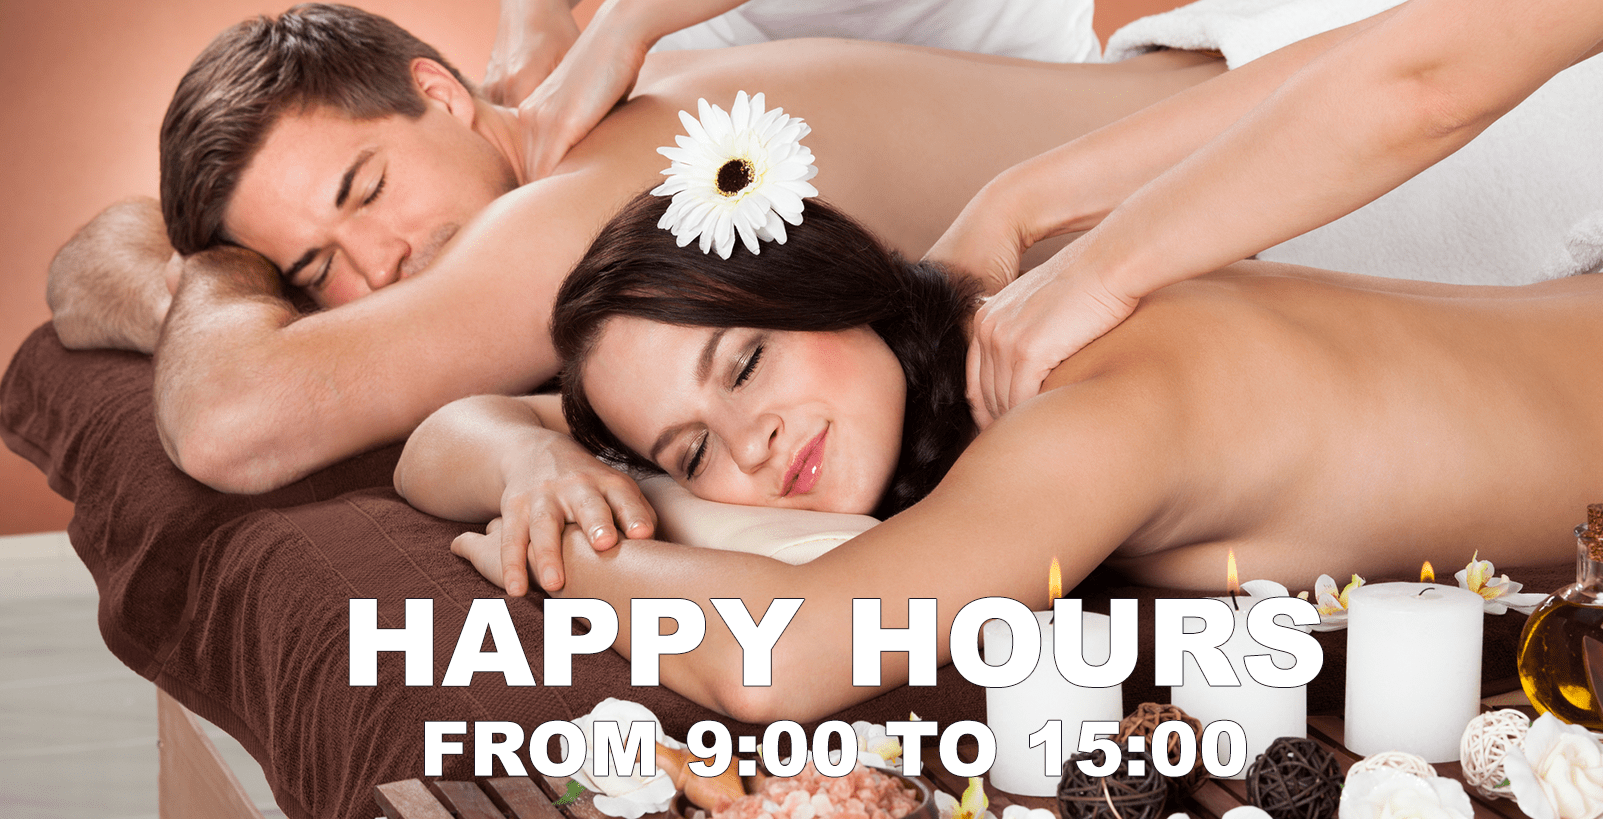 eroticl massage prague escort massage